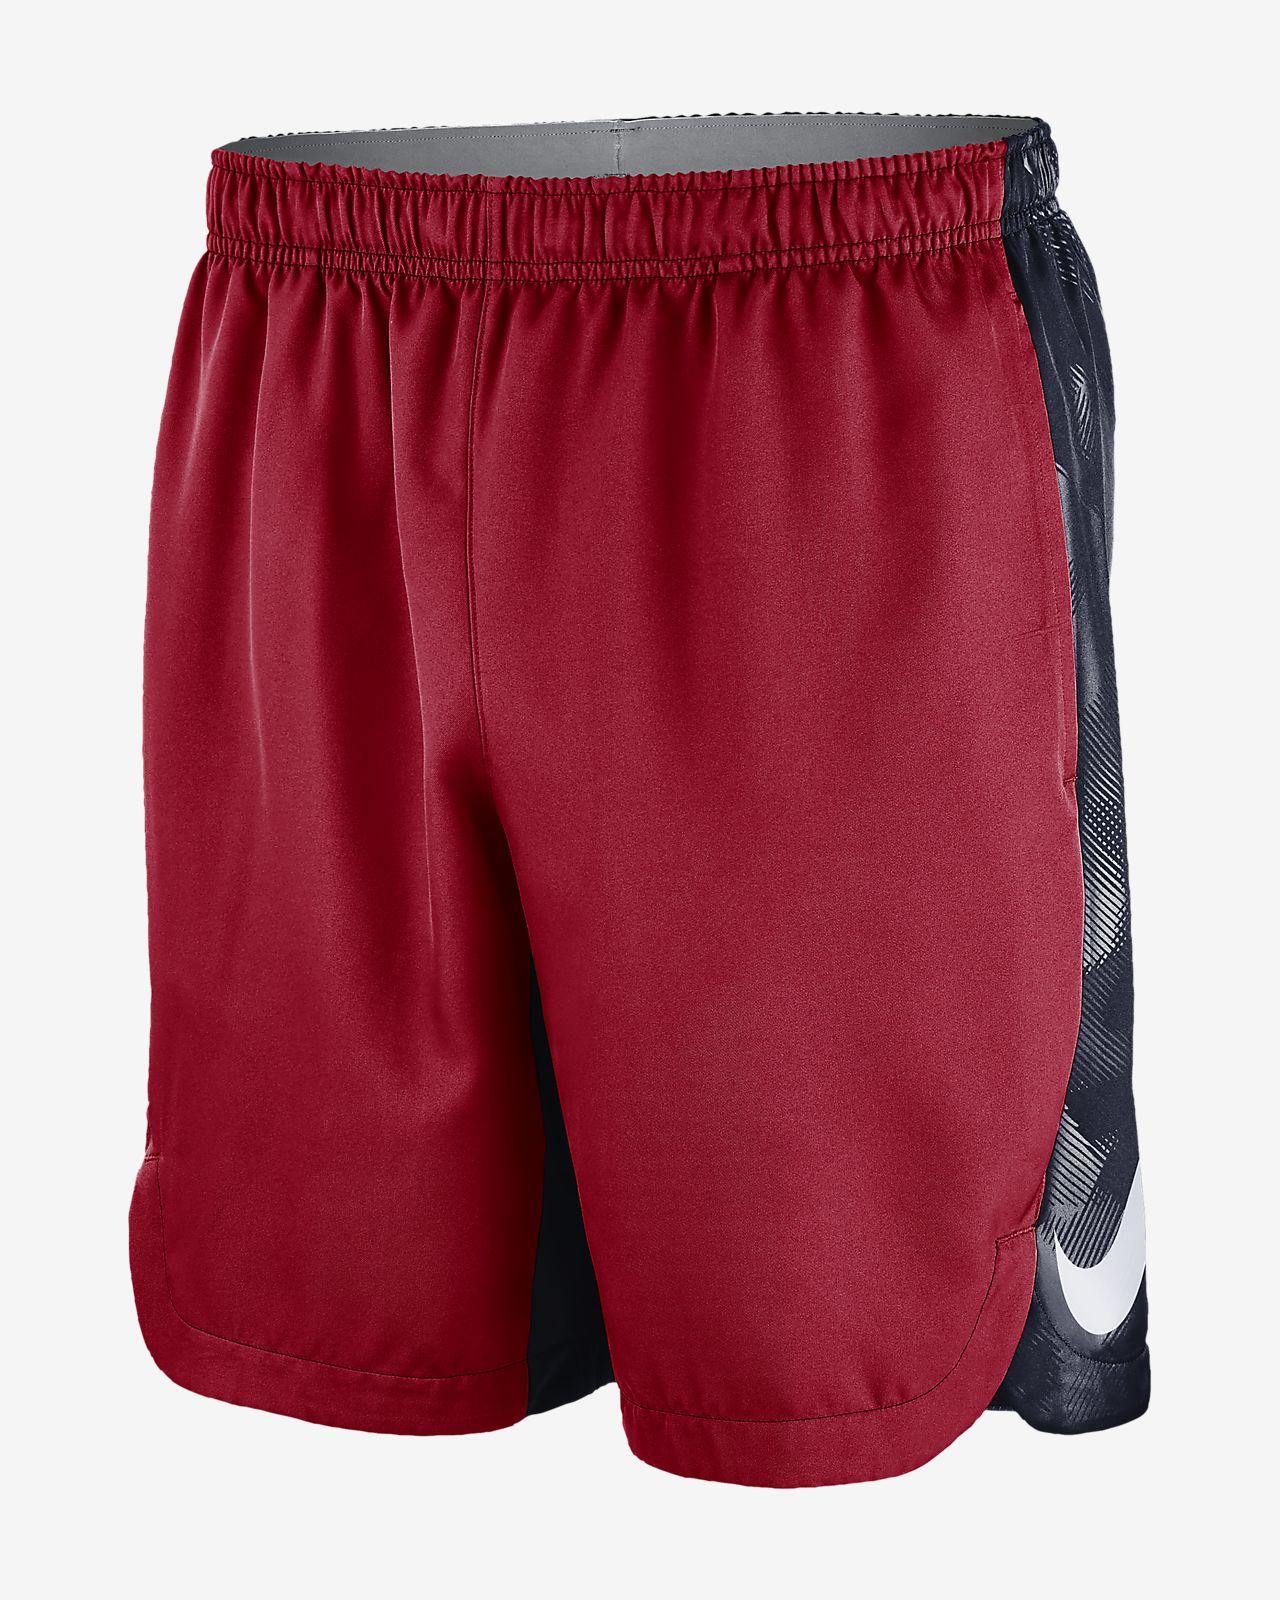 Nike Dri-FIT (MLB Nationals) Men's Shorts